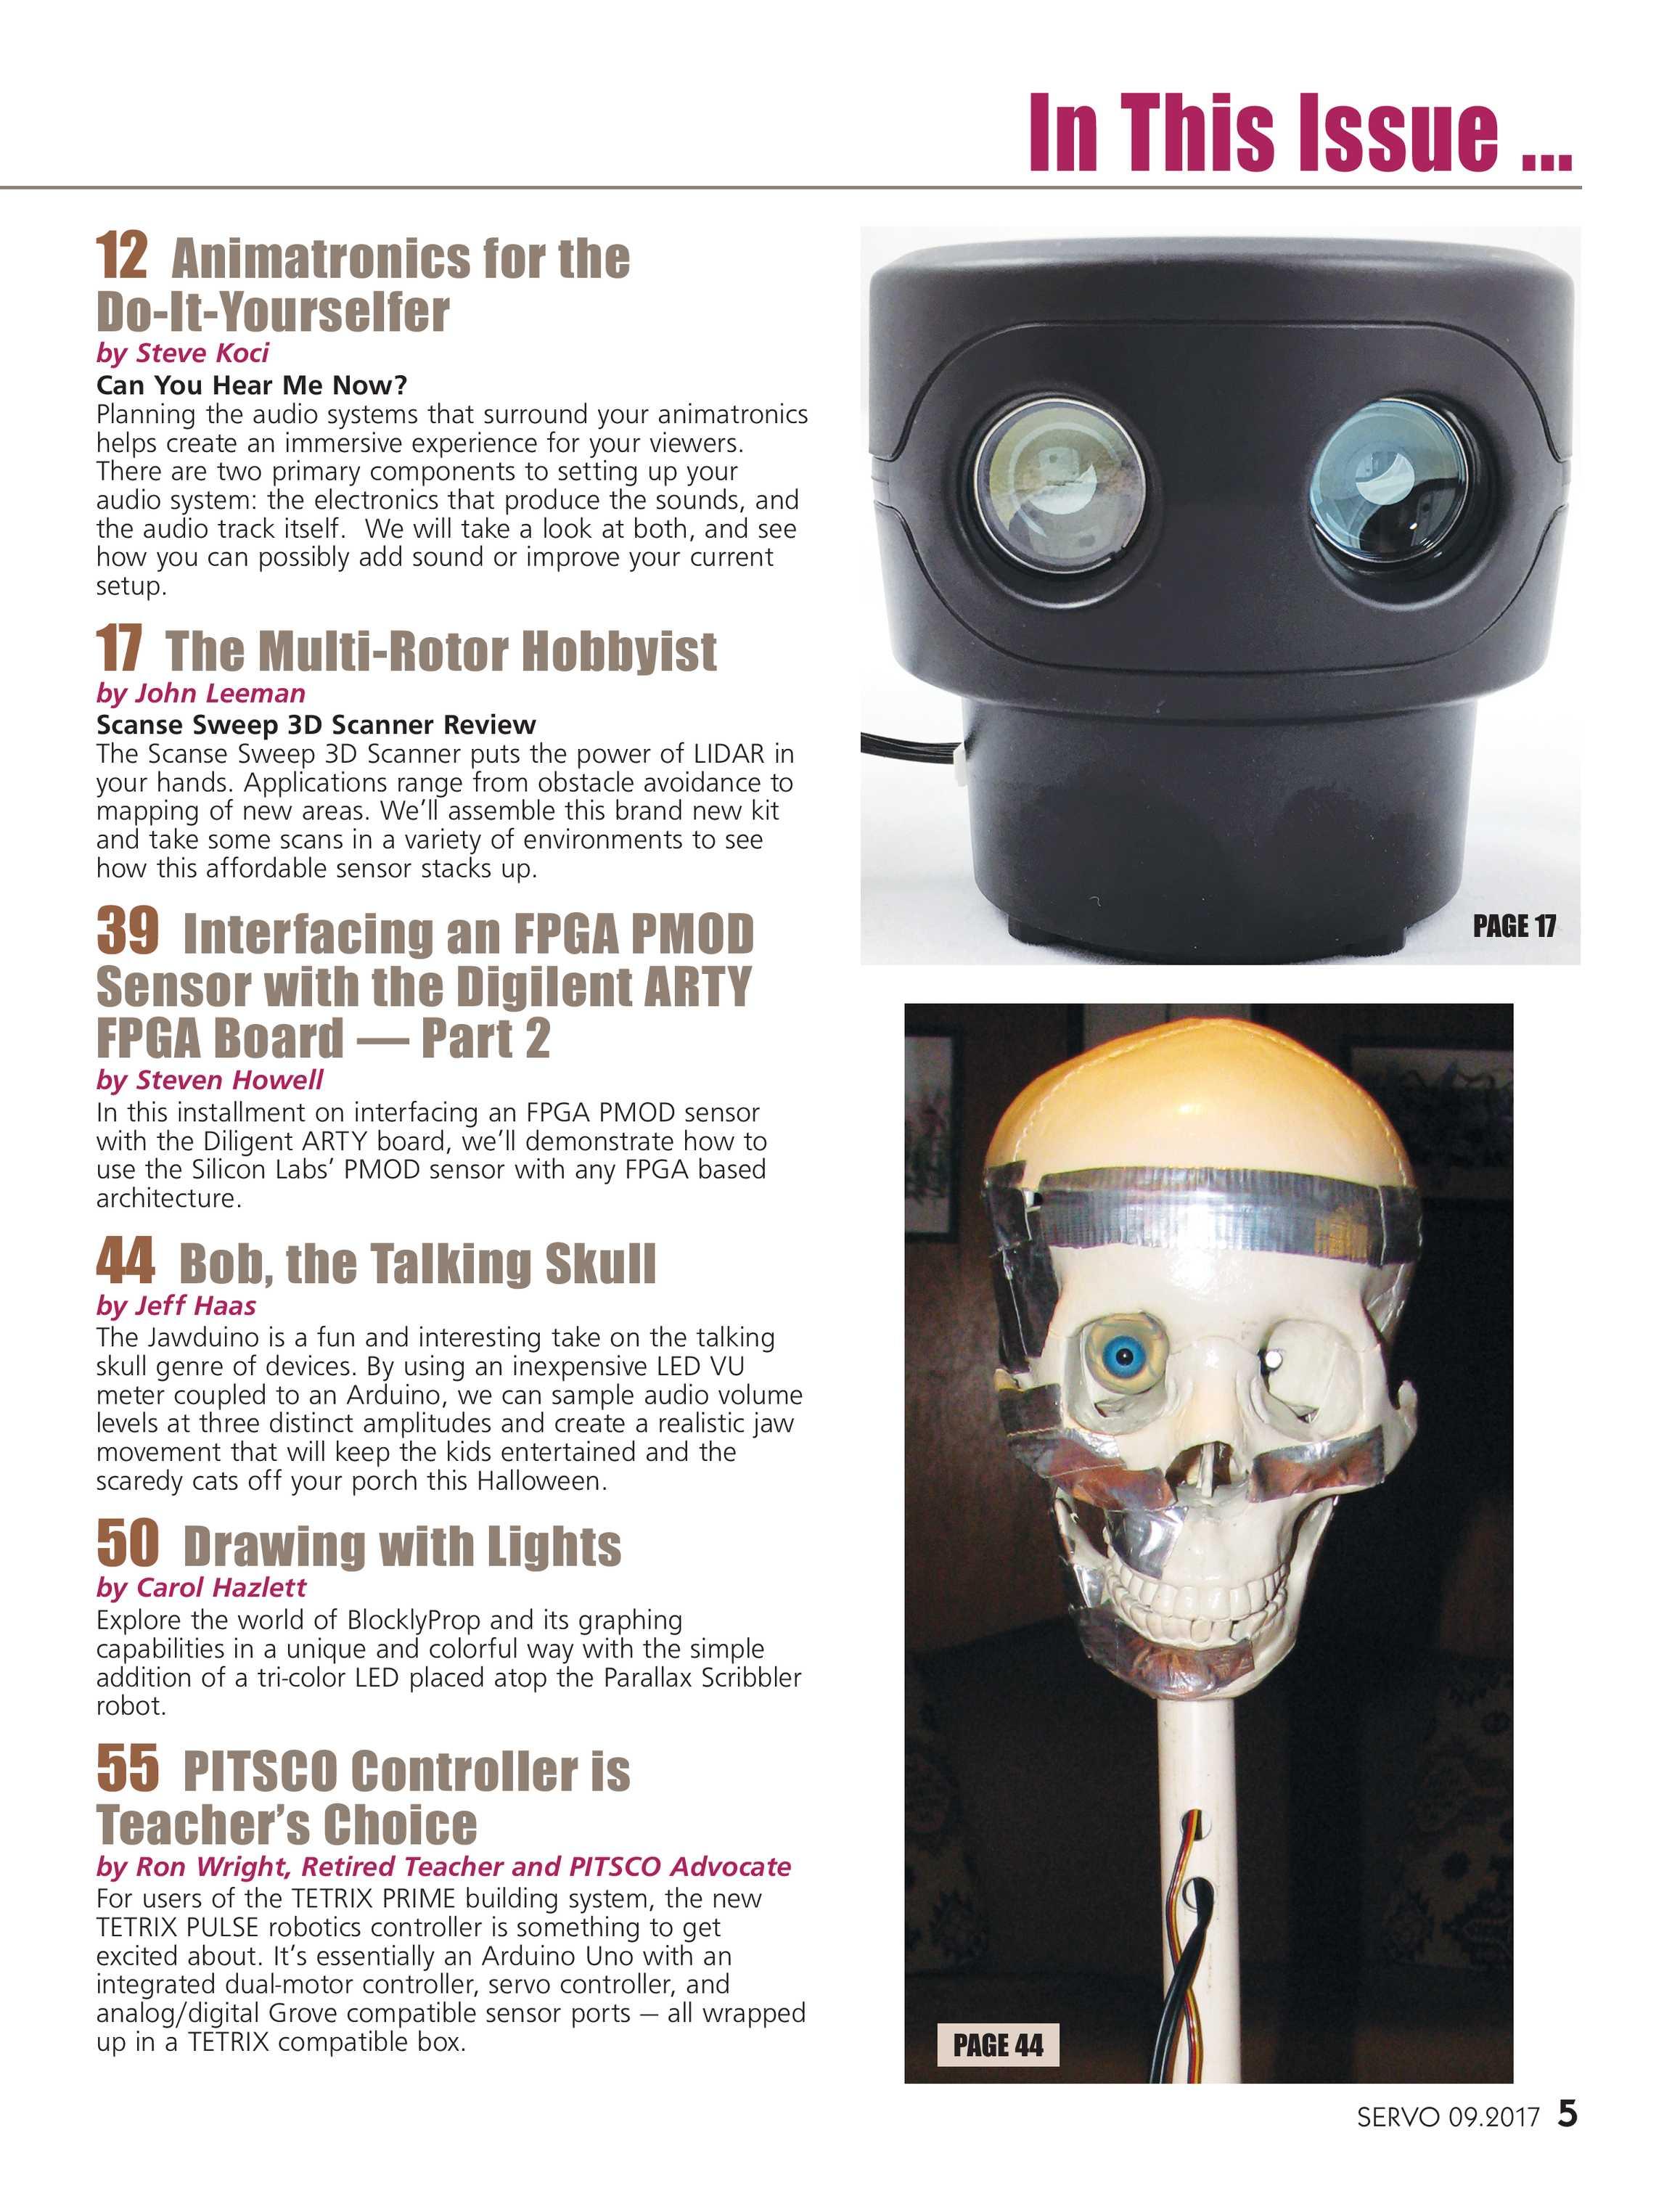 Servo - September 2017 - page 4